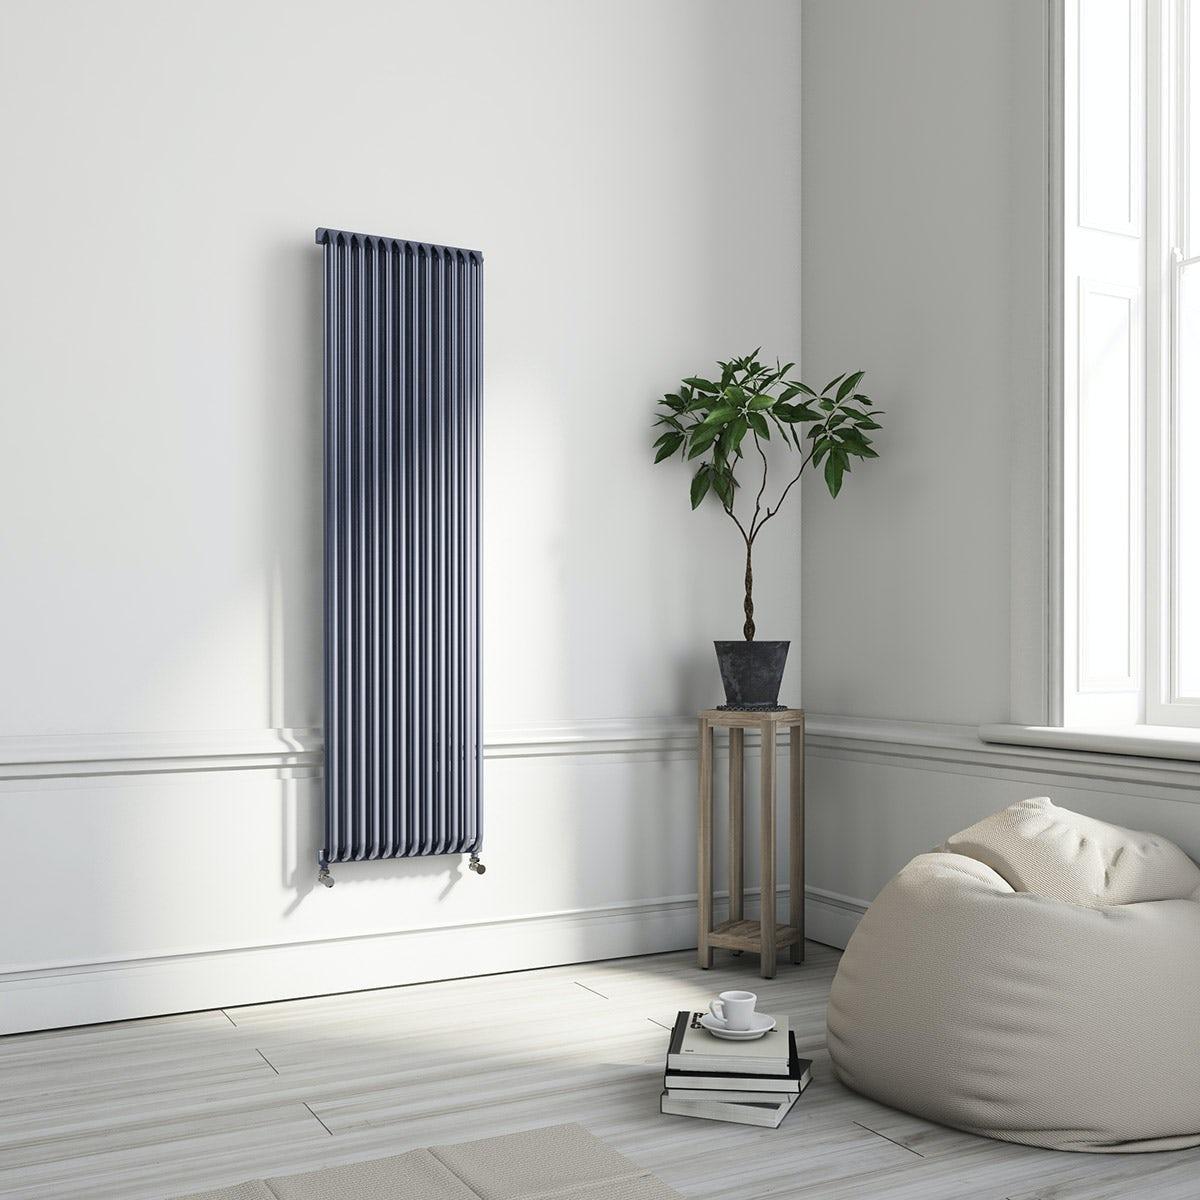 Terma Delfin pigeon blue vertical radiator 1800 x 500